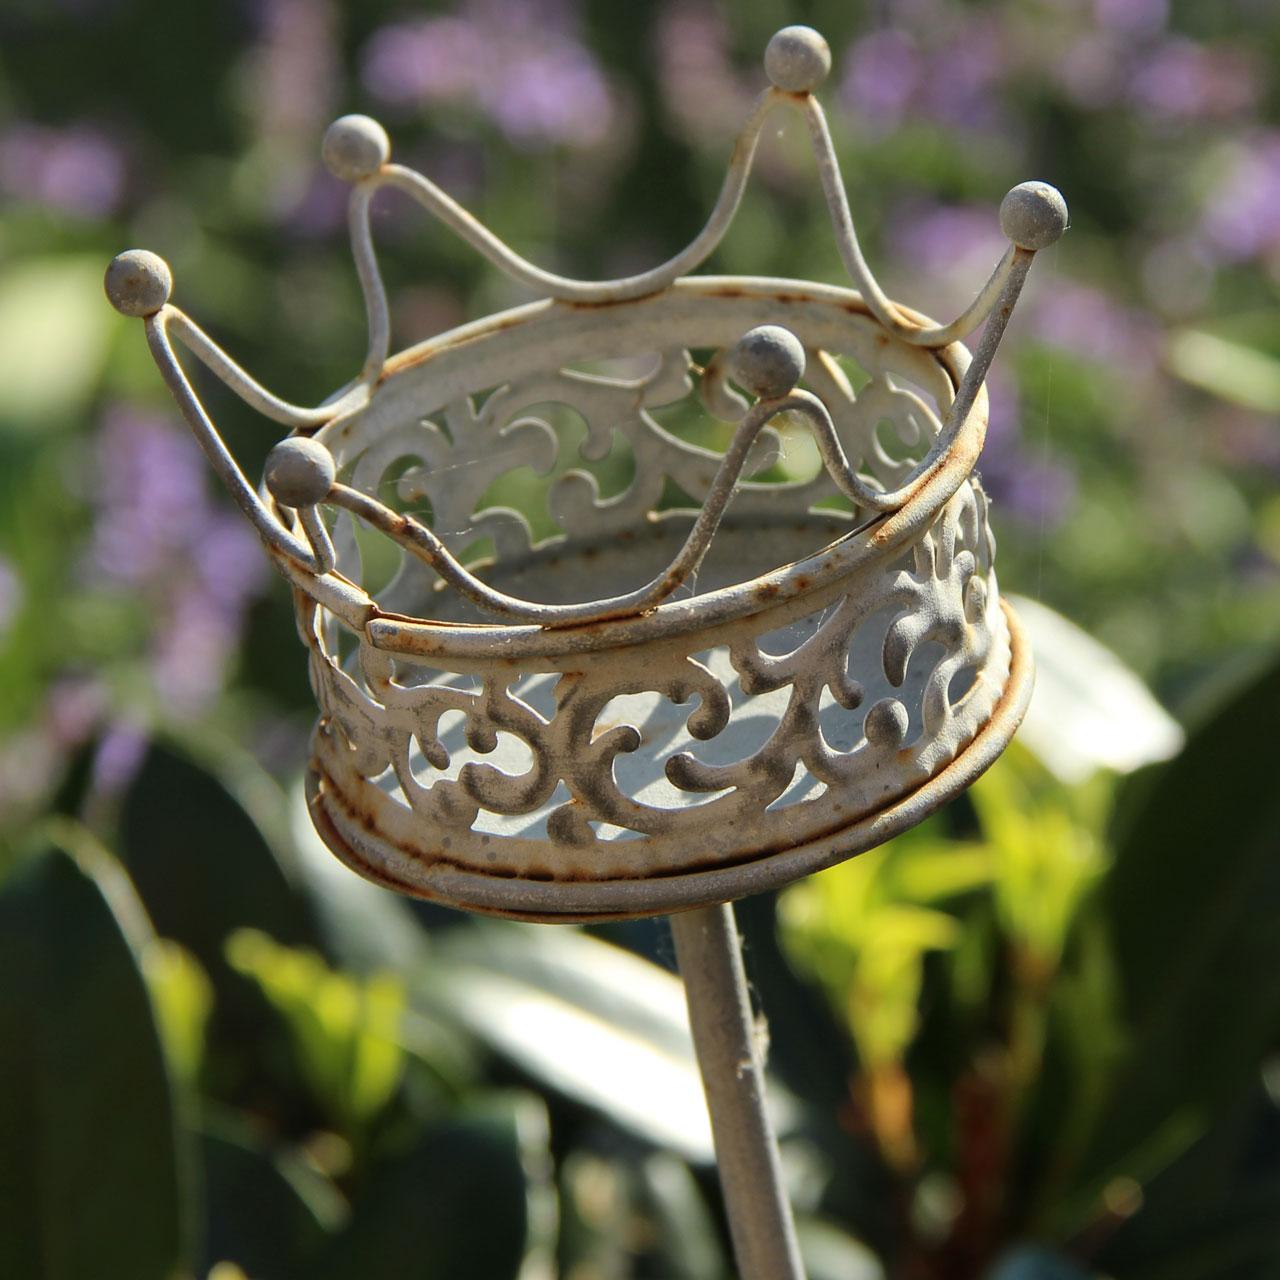 metall gartenstecker krone grau antik balkonerlebnisde